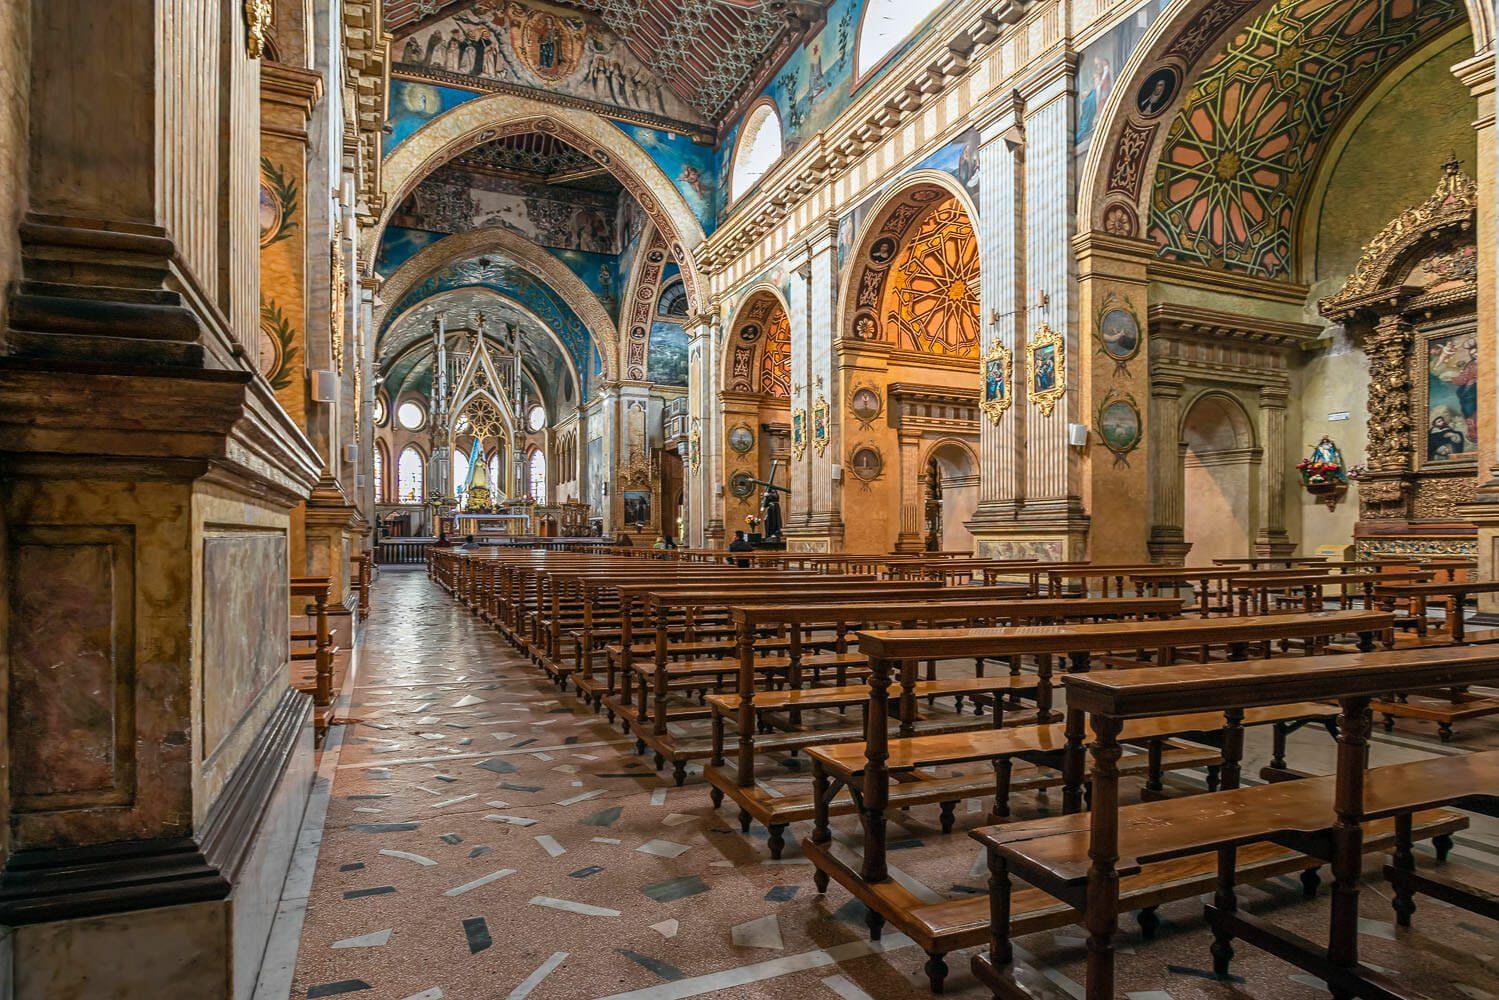 Quito Santo Domingo Church. The neoclassic and baroque central nave